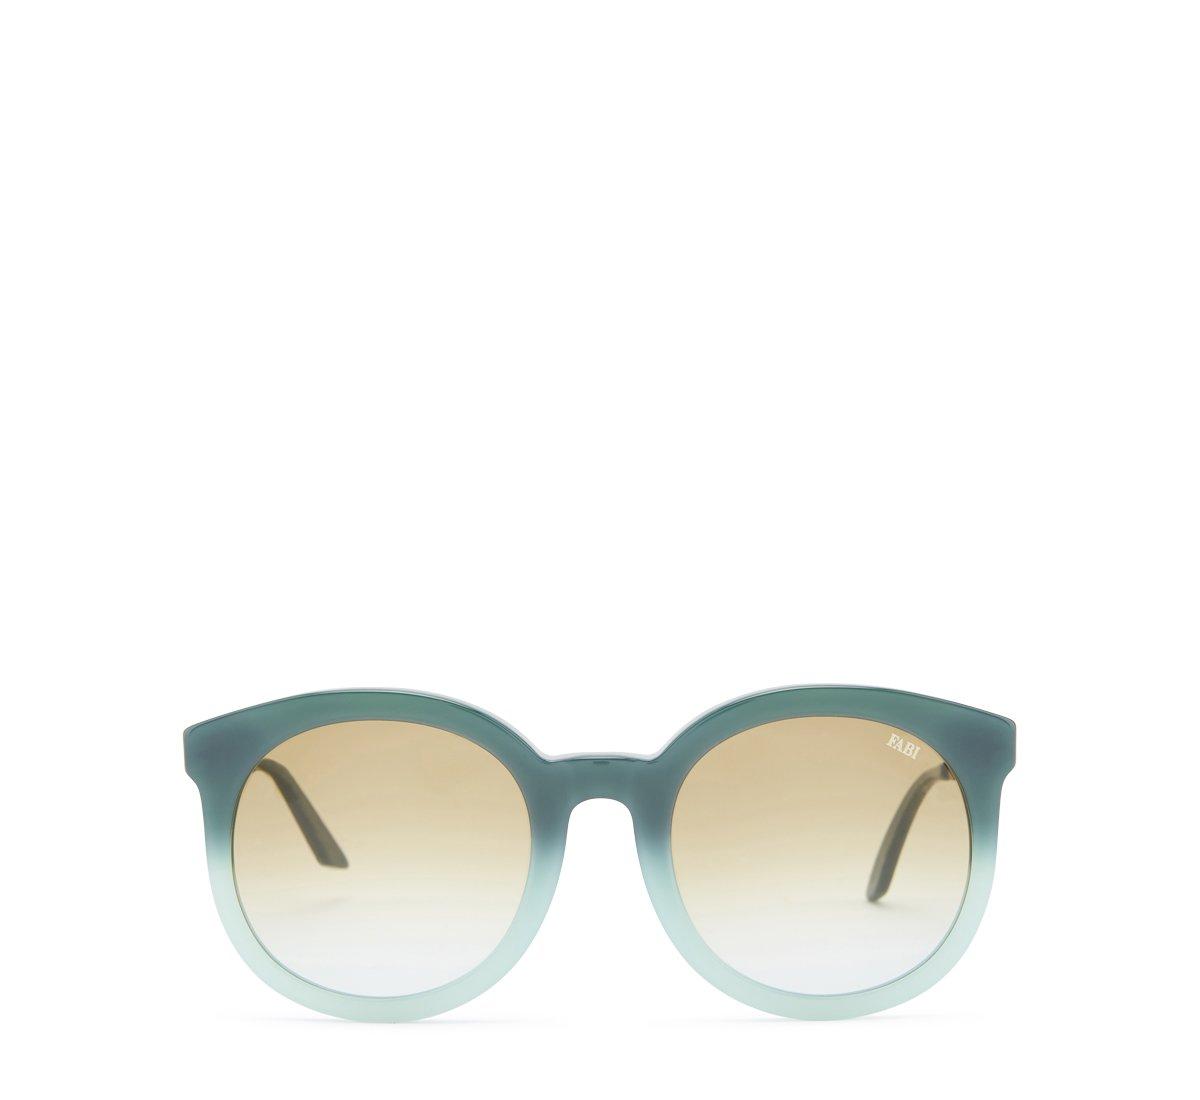 Occhiale Stefy verde